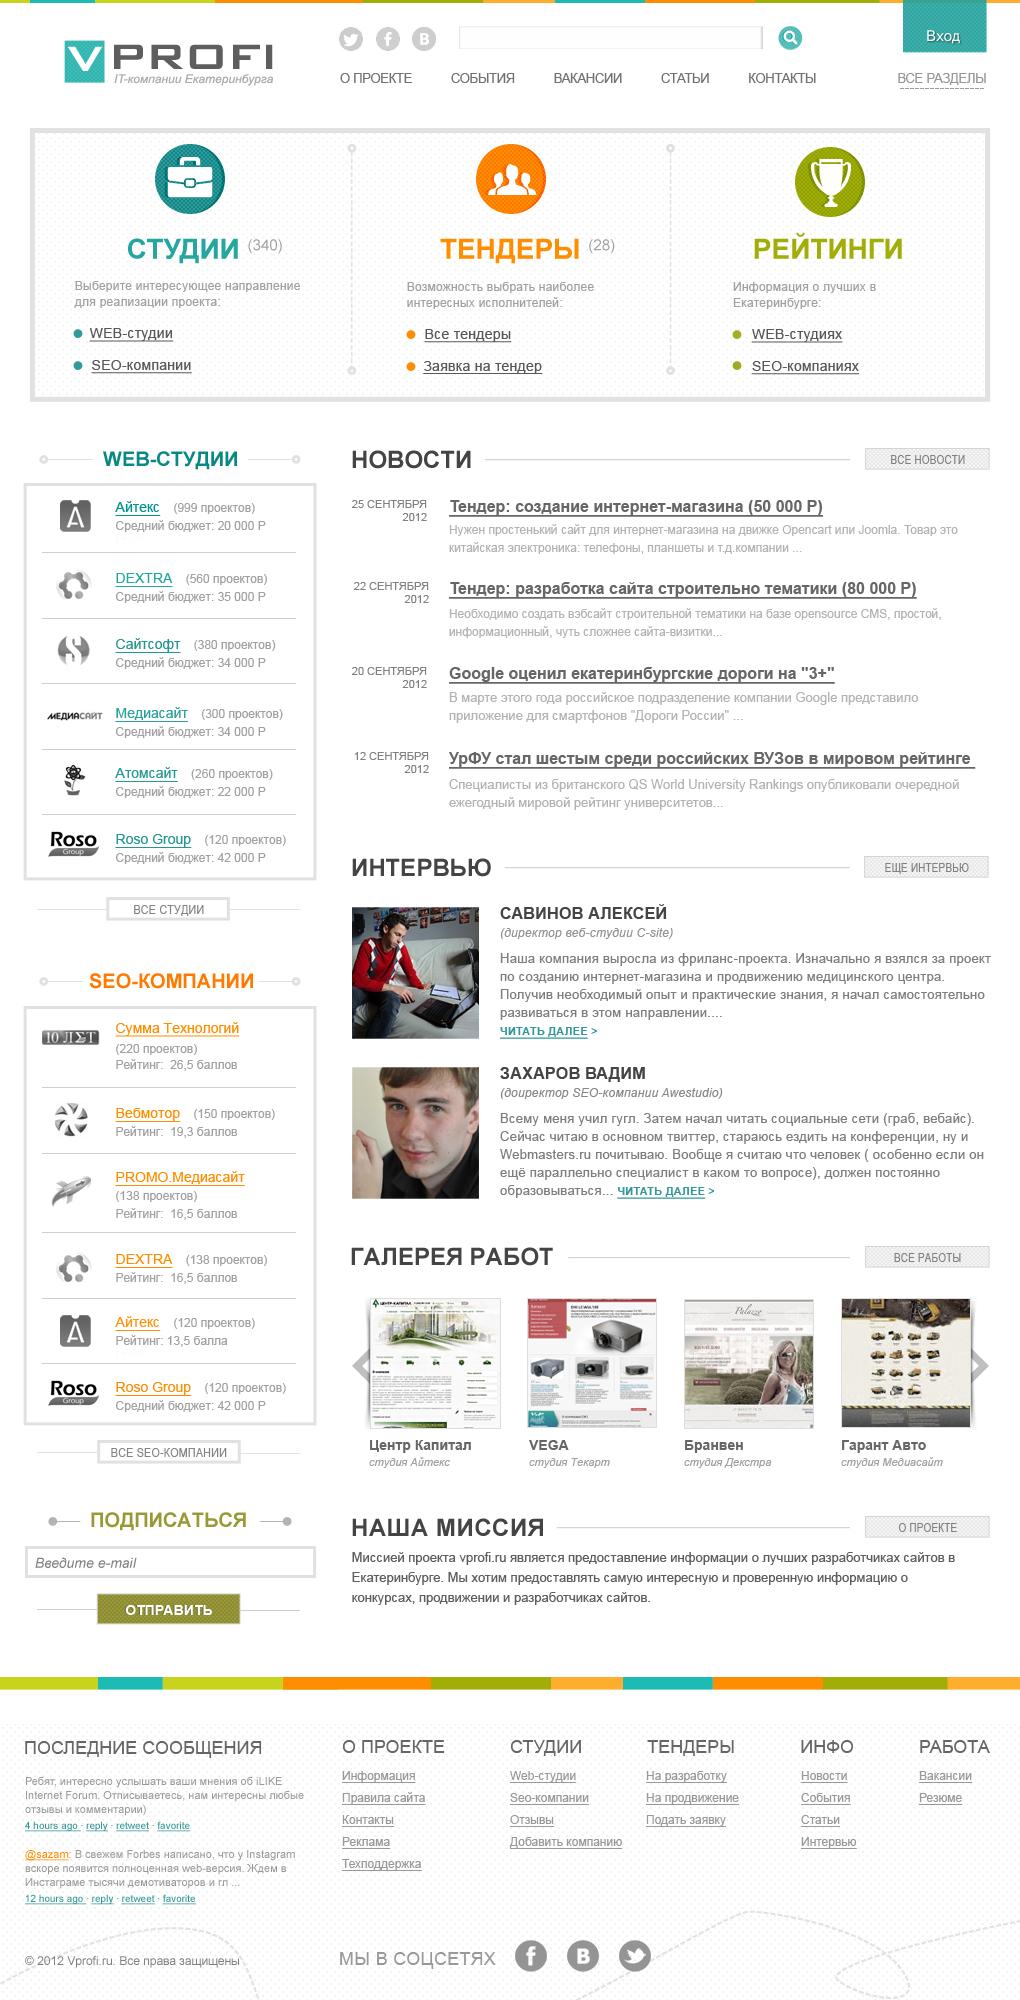 Сайт рейтинга веб-студий